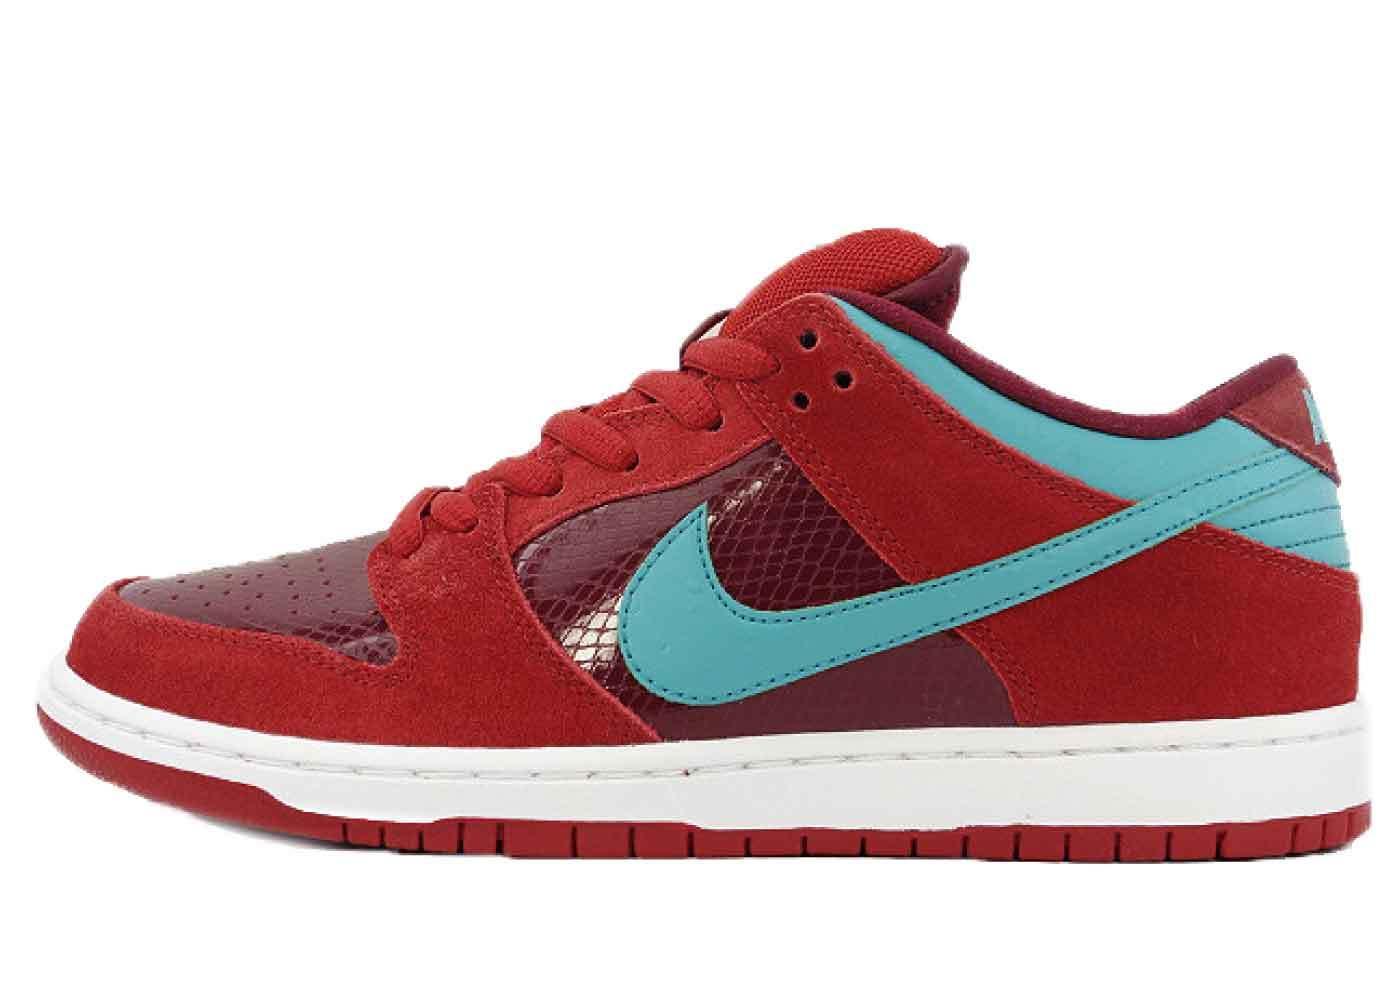 Nike Dunk SB Low Brickhouse Turbo Greenの写真